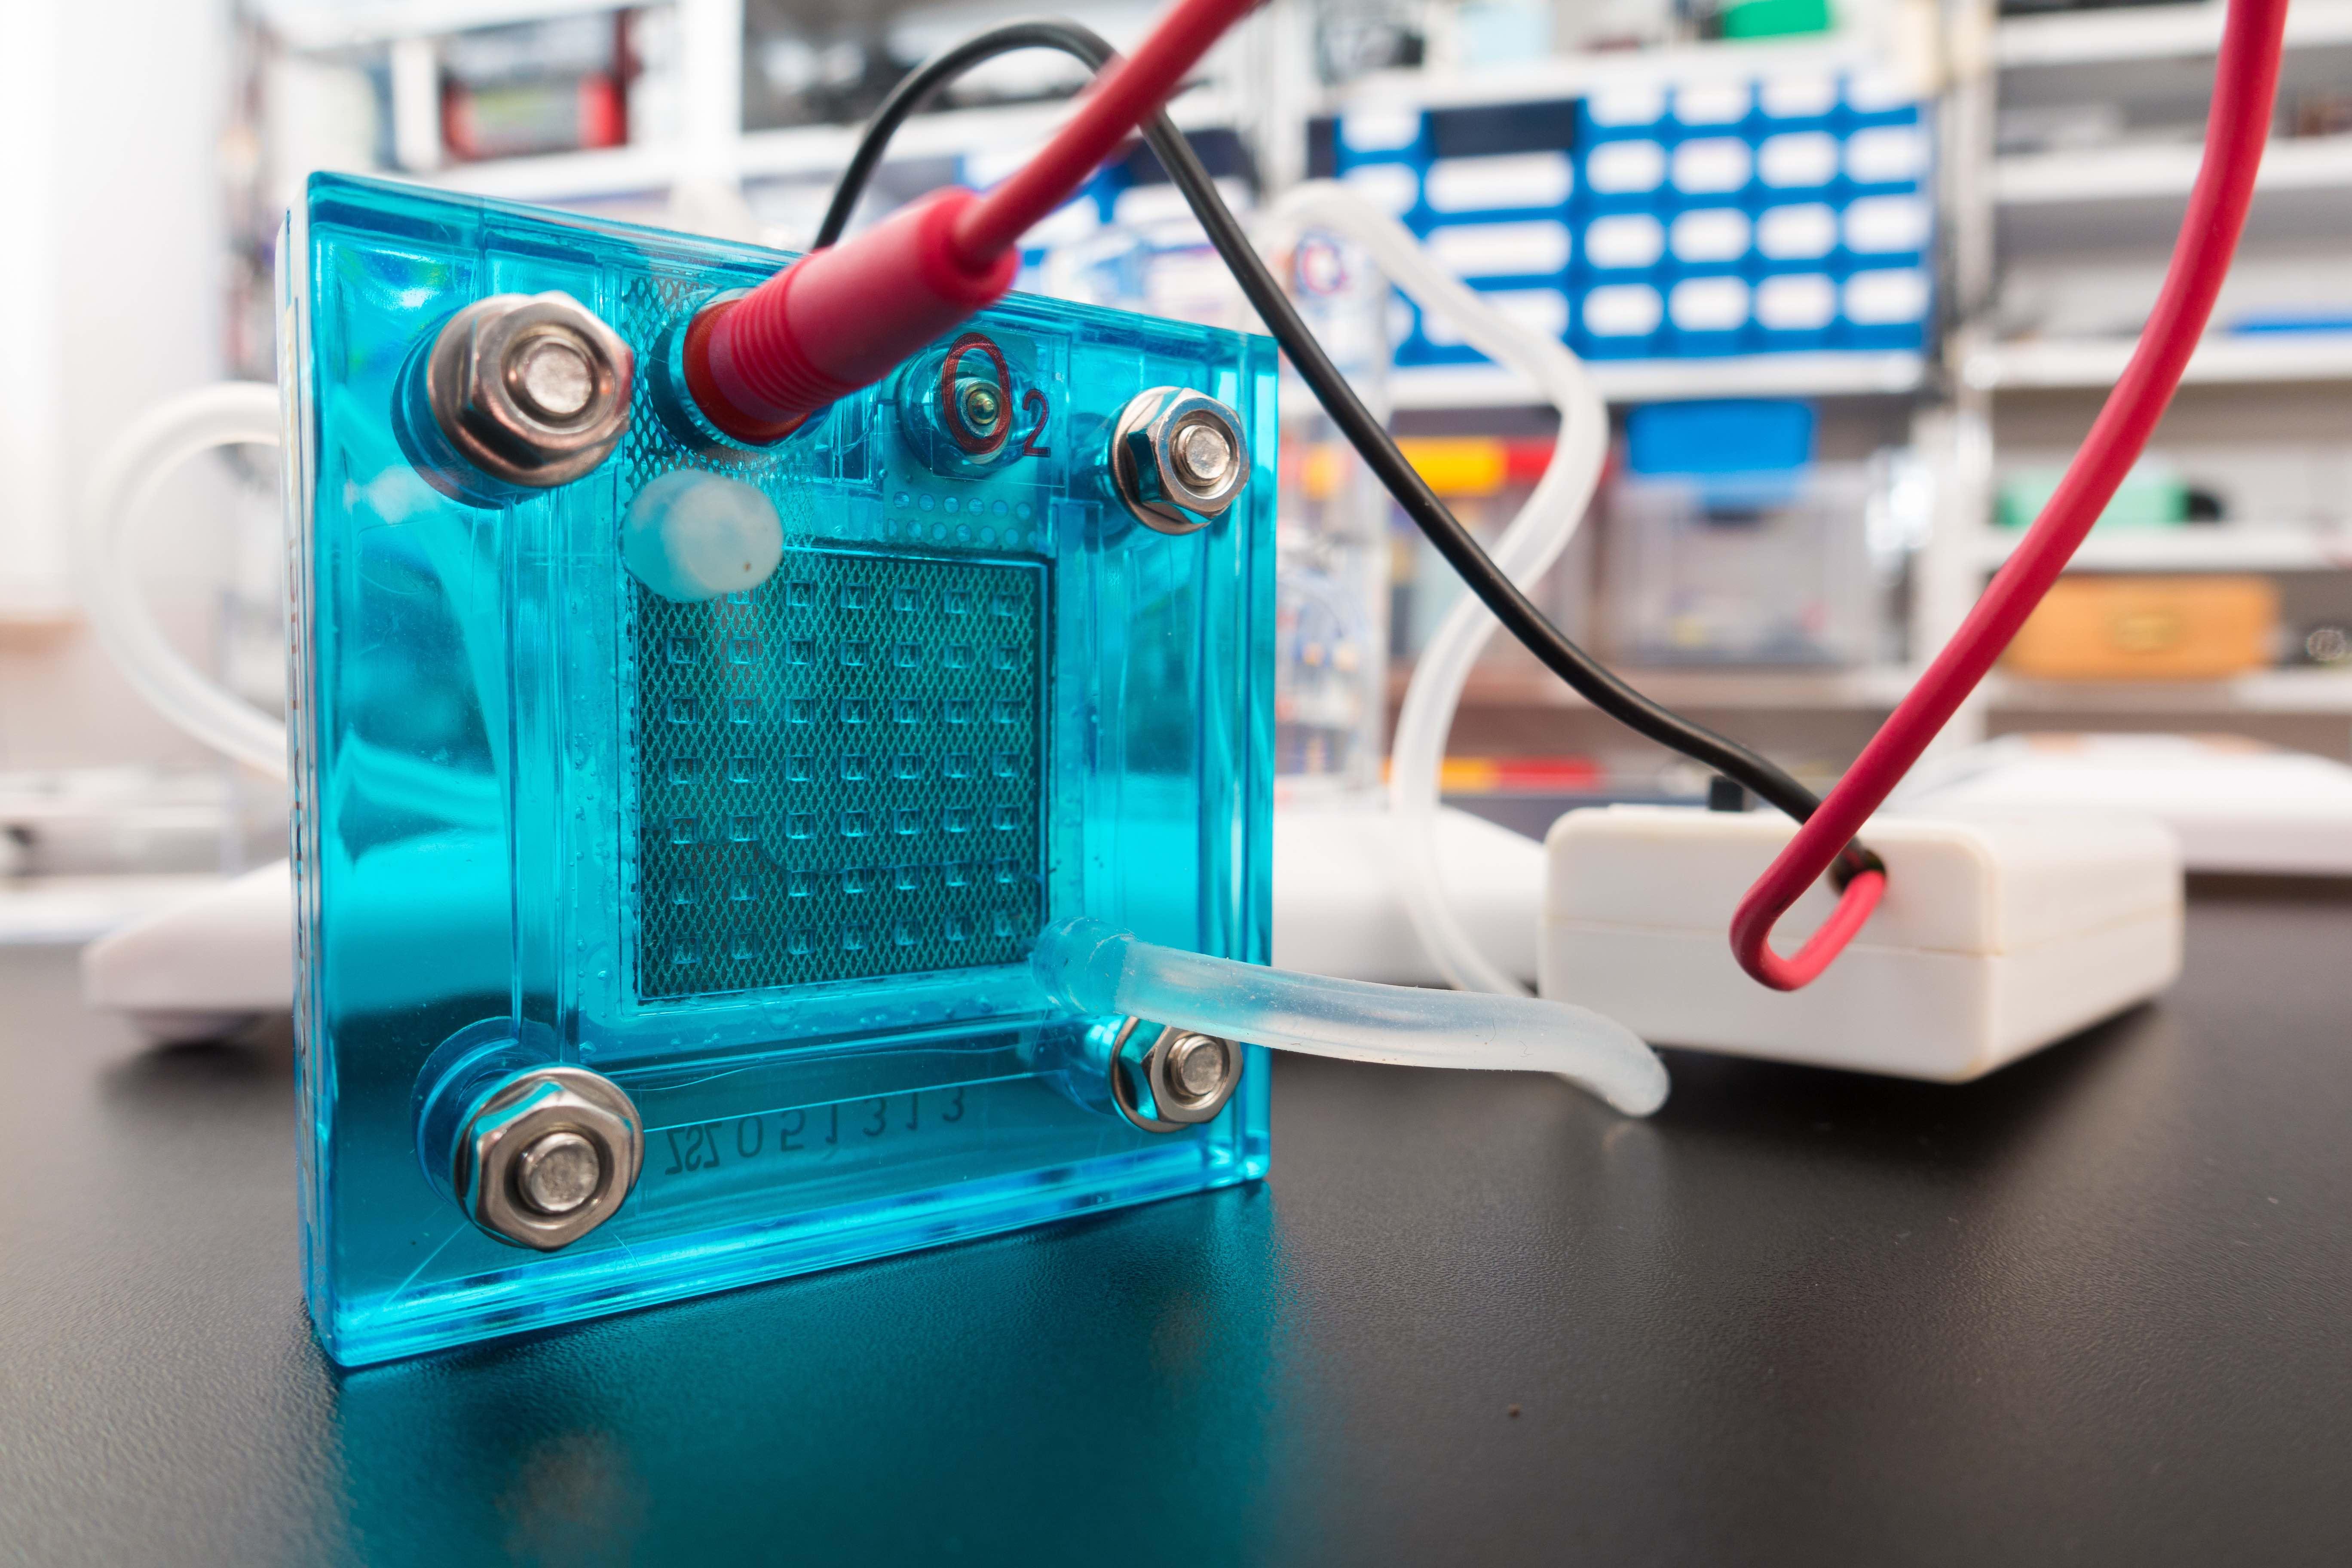 Hydrogen fuel cells allow smart energy consumption